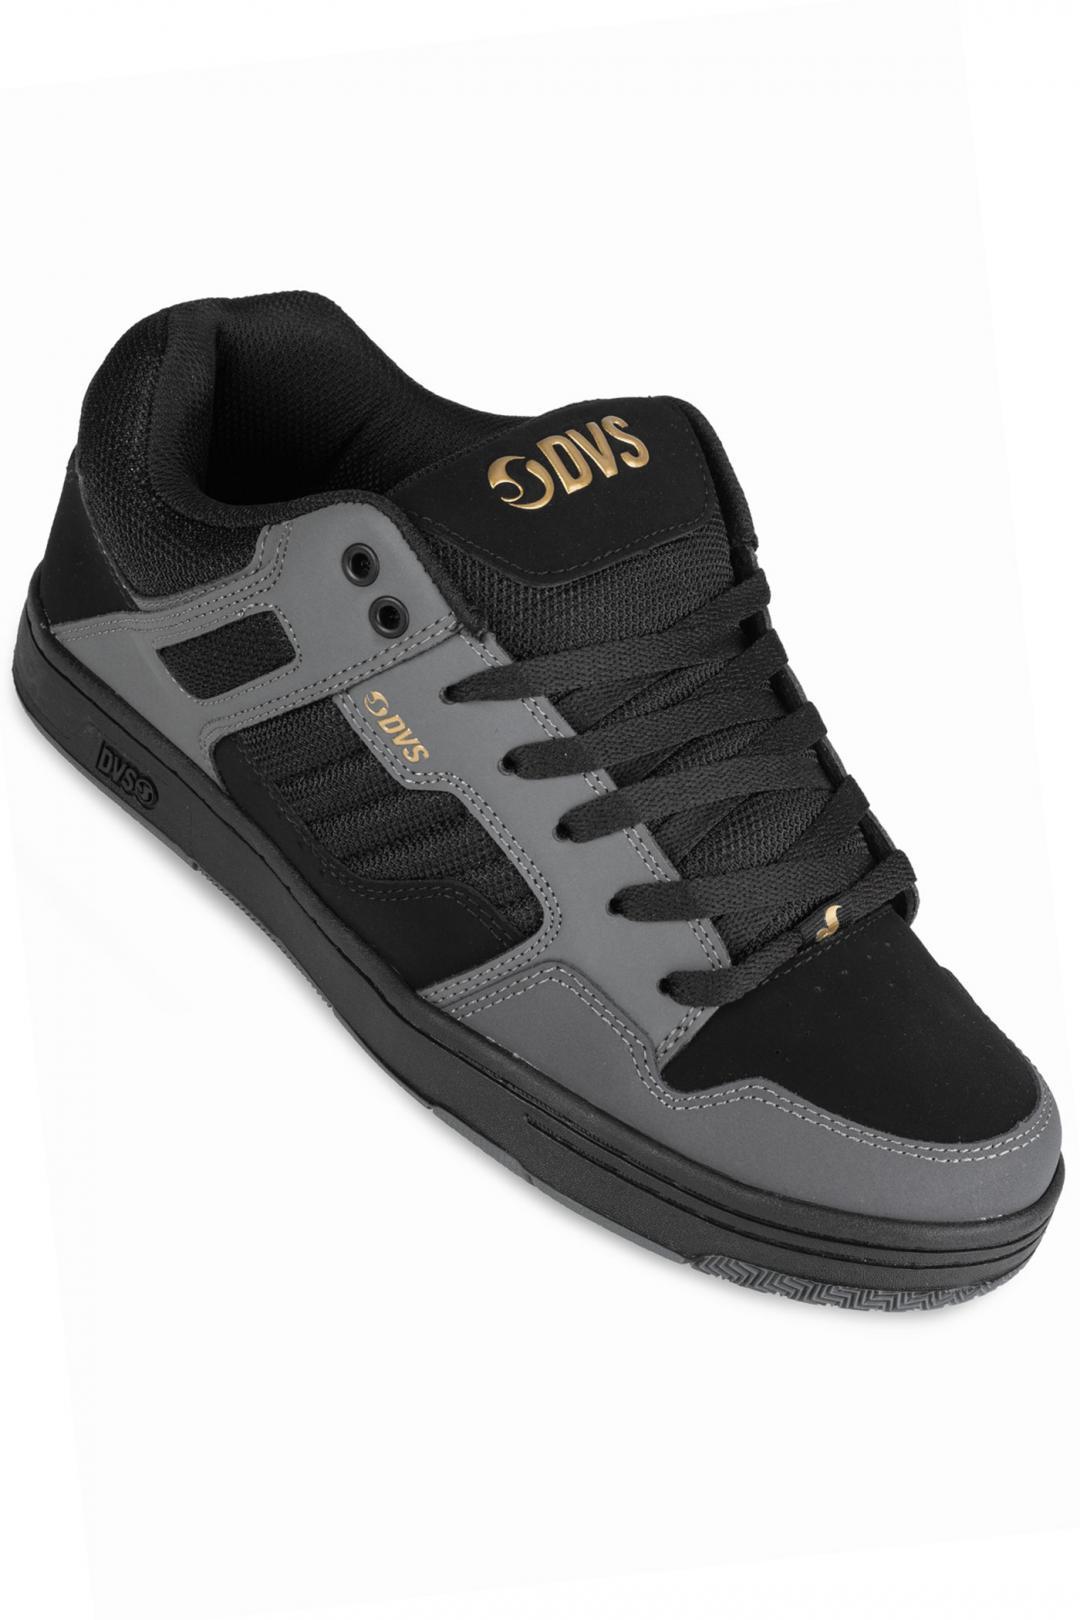 Uomo DVS Enduro 125 castlerock black anderson | Sneaker